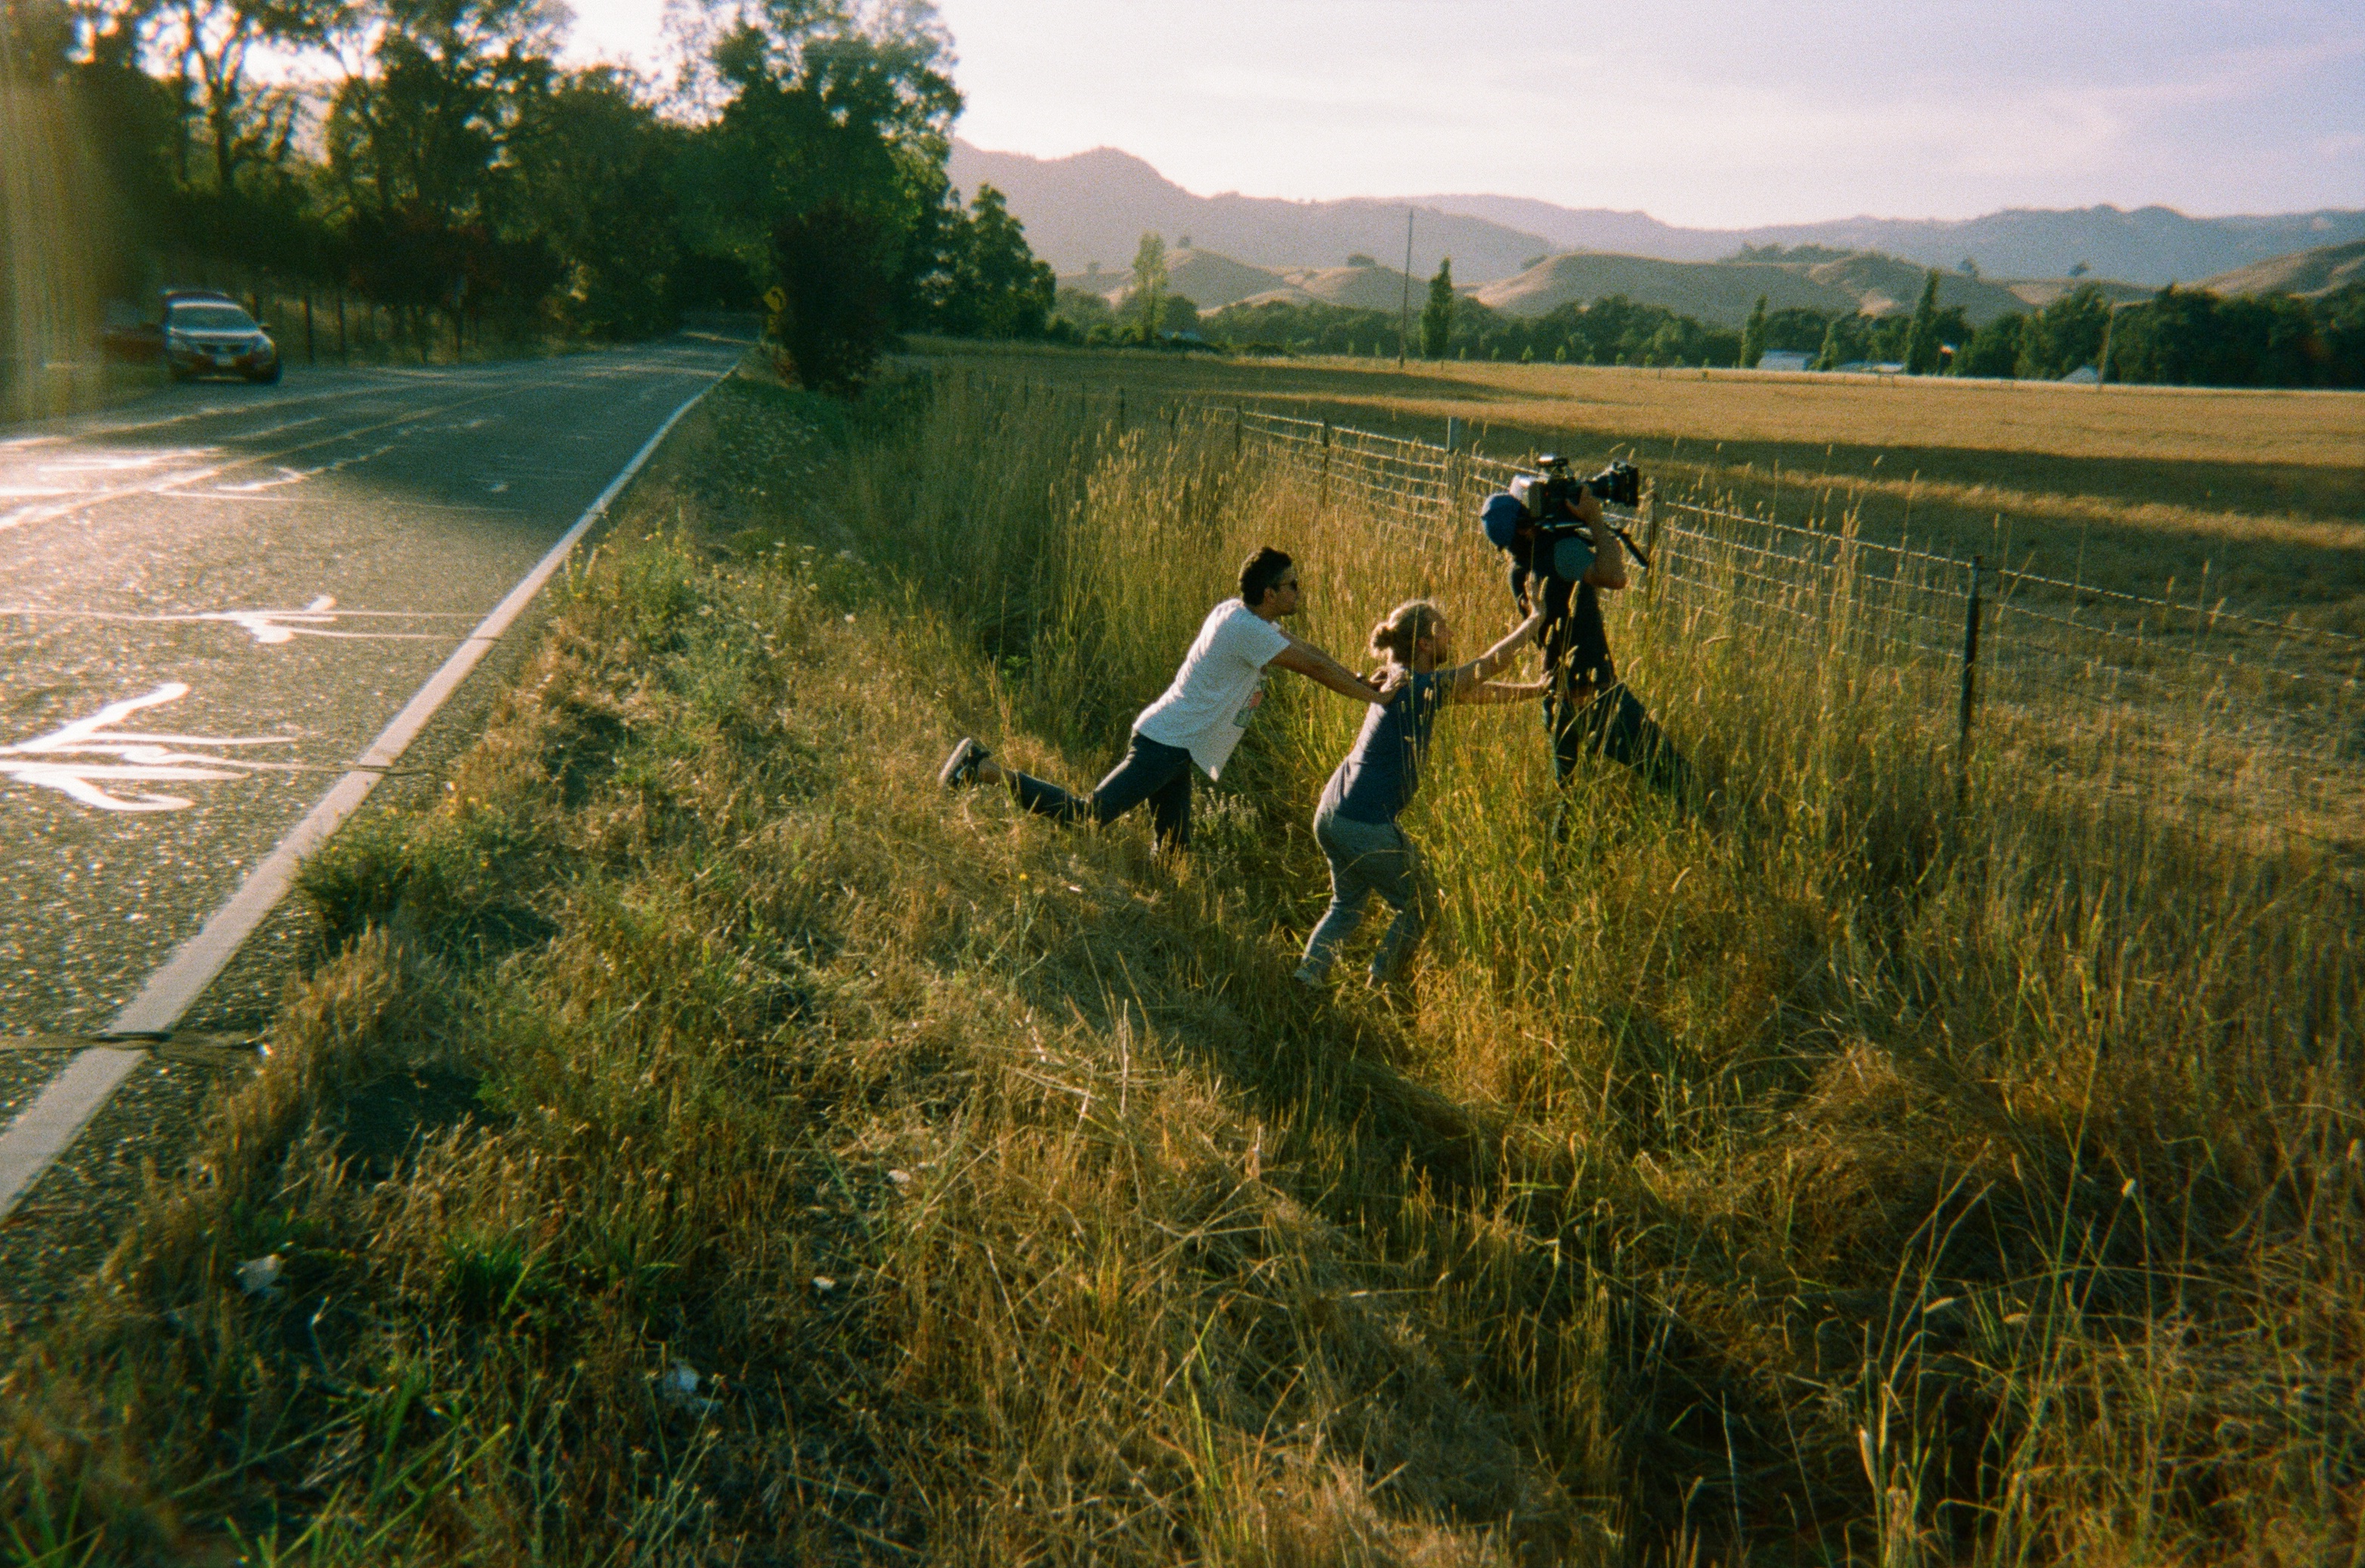 Behind the Scenes of SurfAir, Directed by John Christopher Pina and Benjamin Kutsko